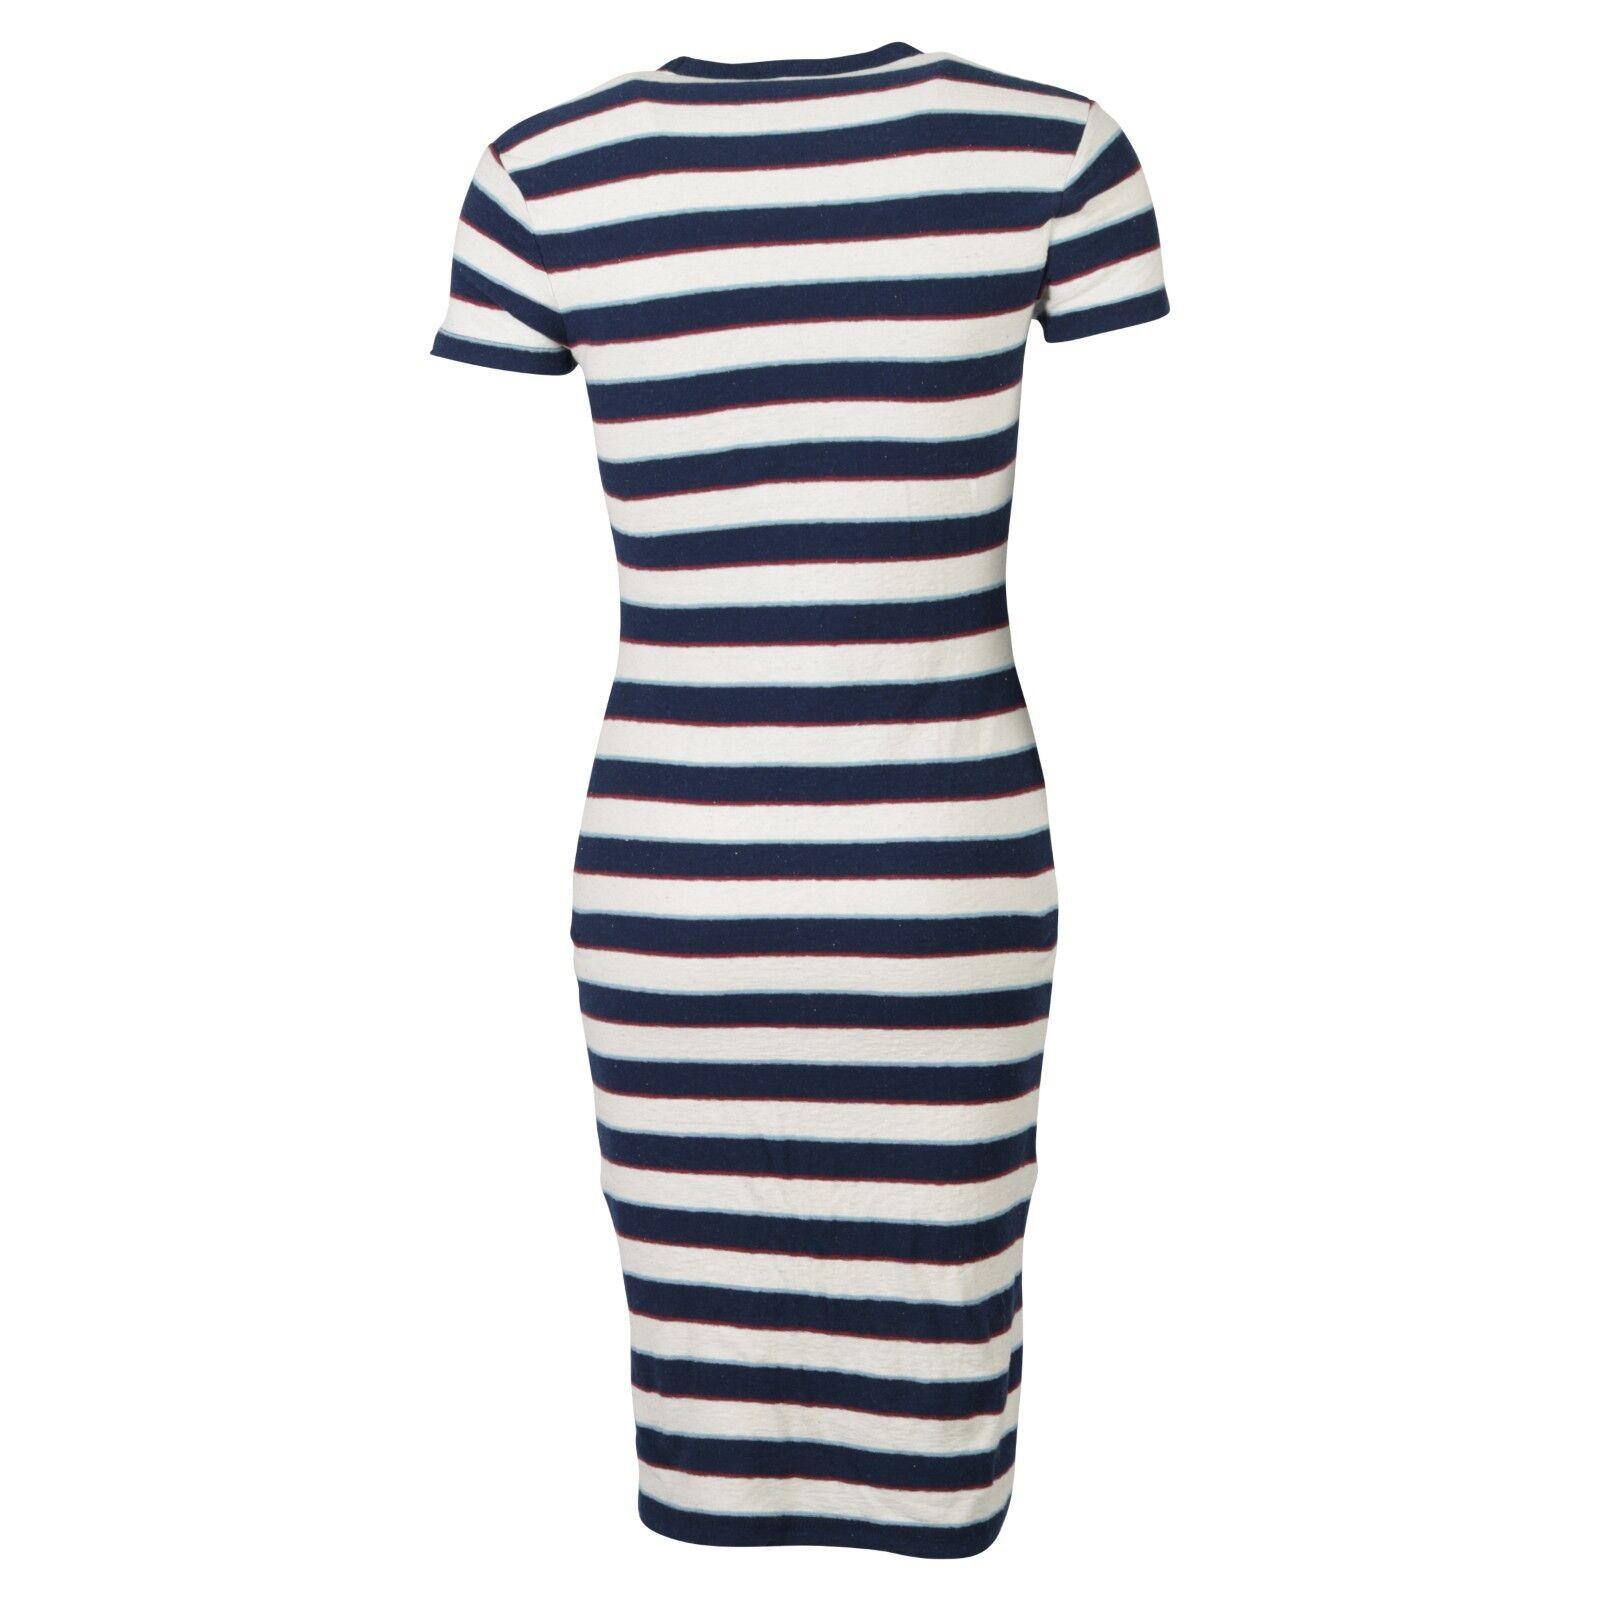 508c5617c04 S NEU69331 JAMES PERSE T-Shirt Kleid gestreift blue CREME BAUMWOLLE  BAUMWOLLE BAUMWOLLE GR. S NEU69331